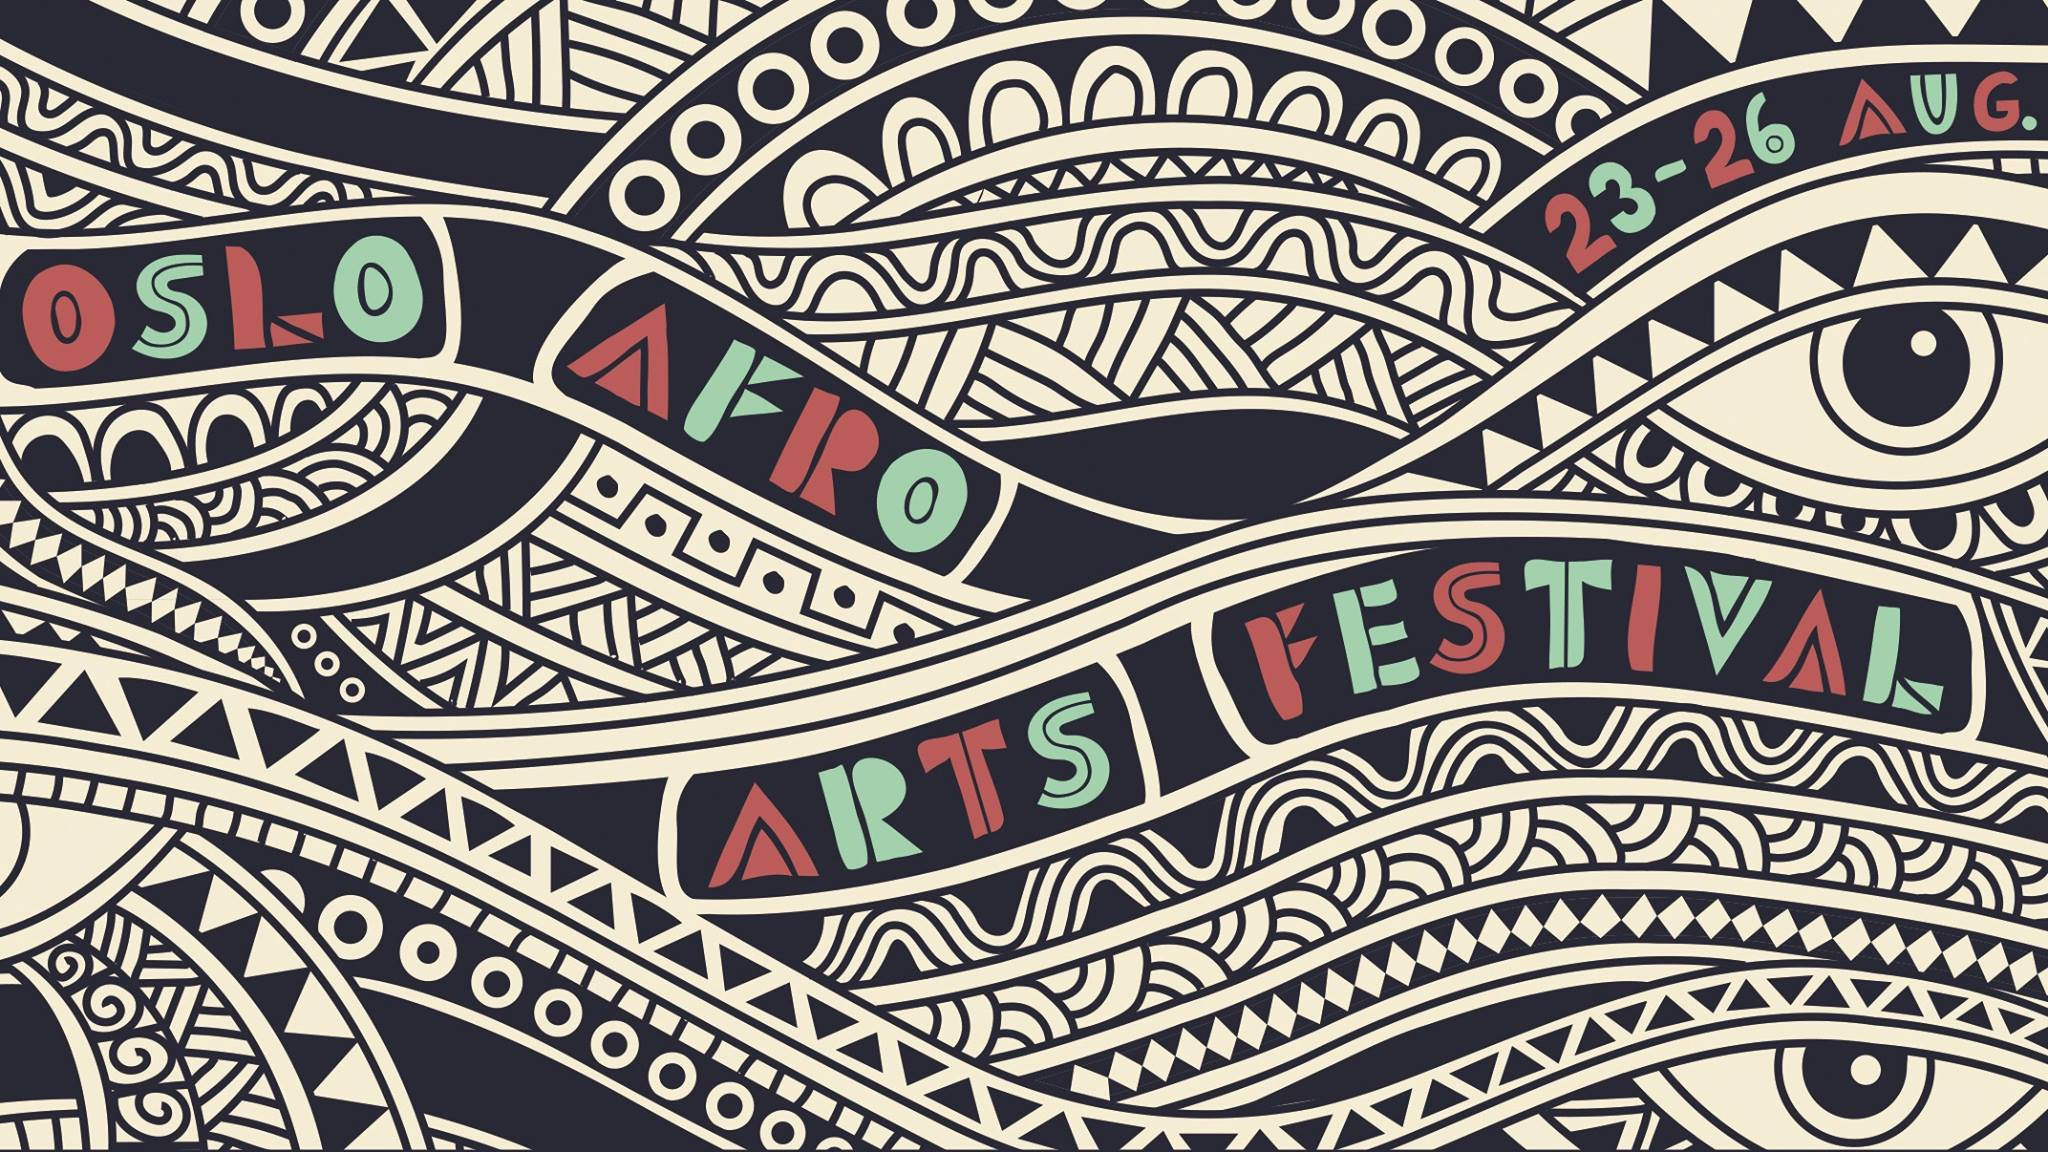 oslo afro arts